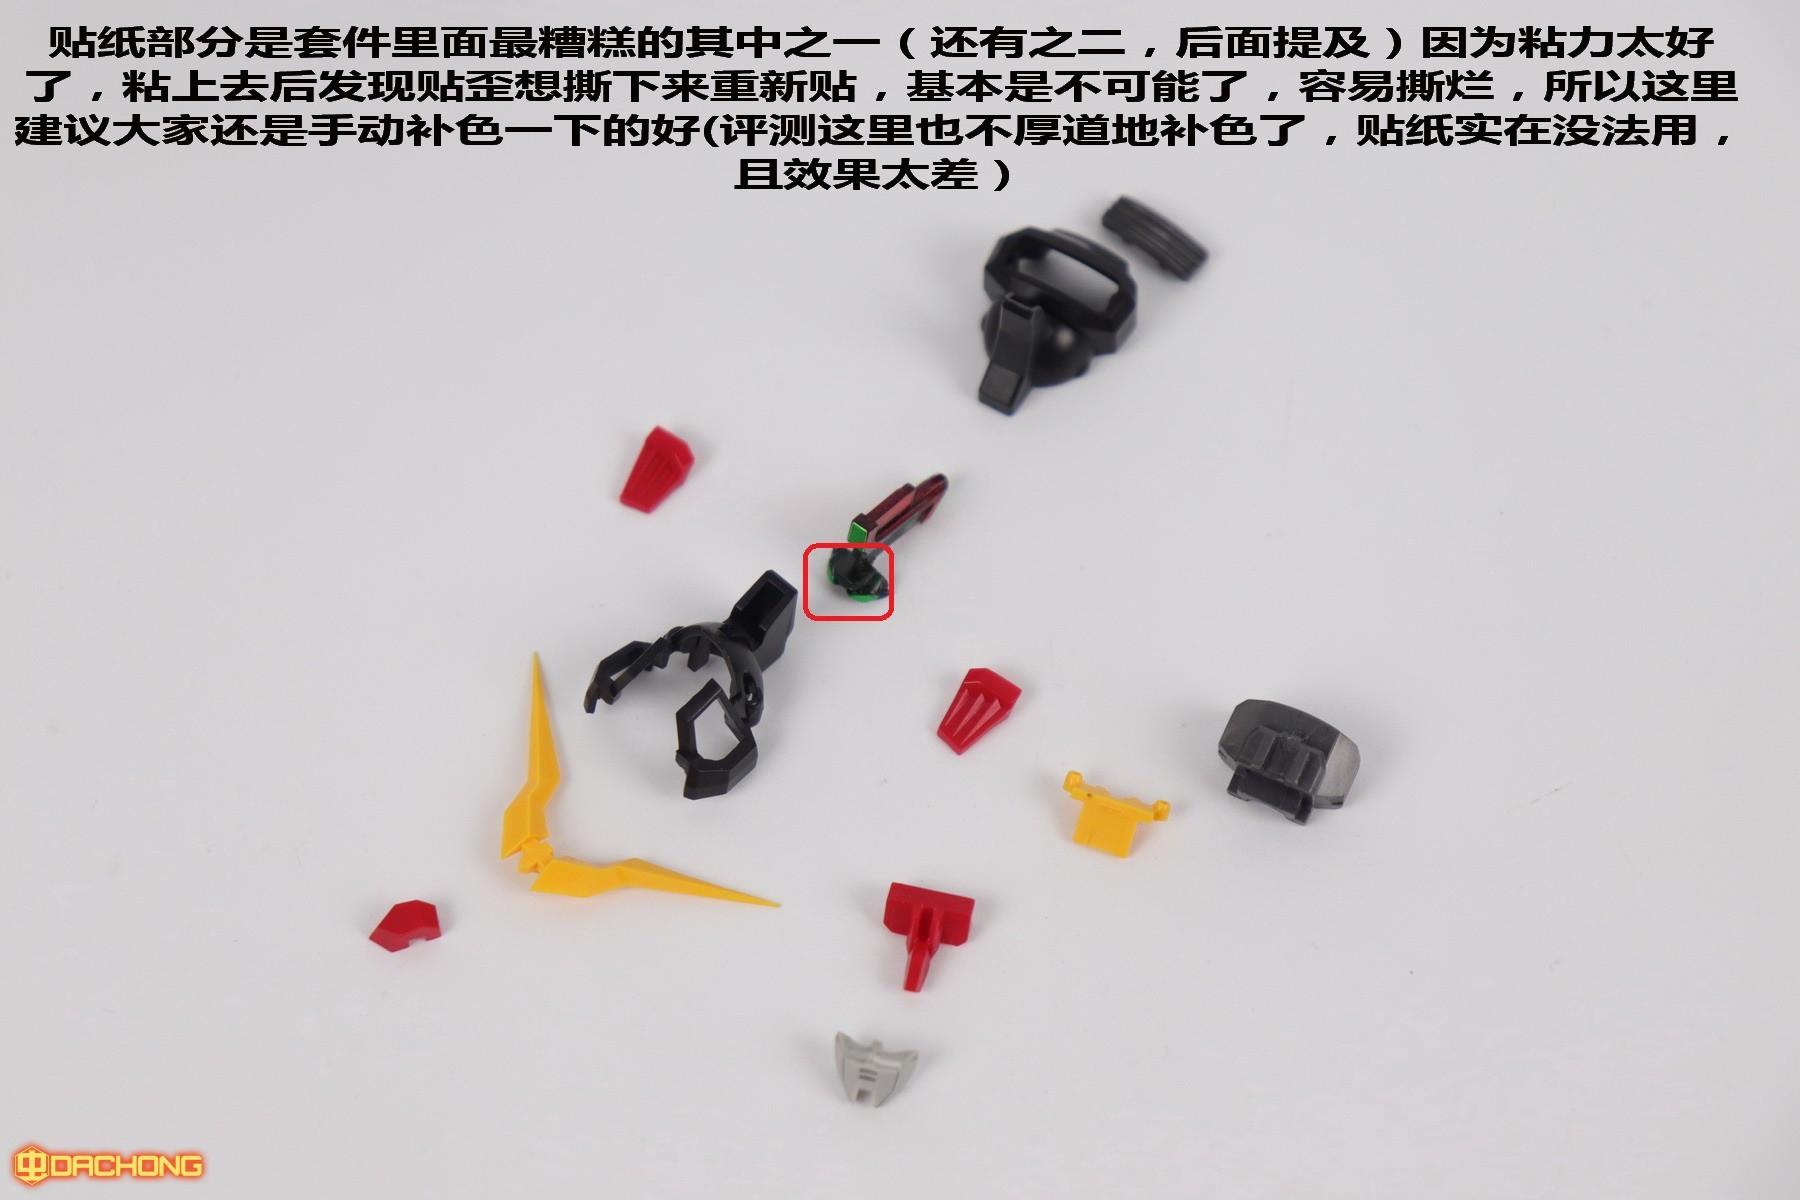 S348_Death_INASK_014.jpg